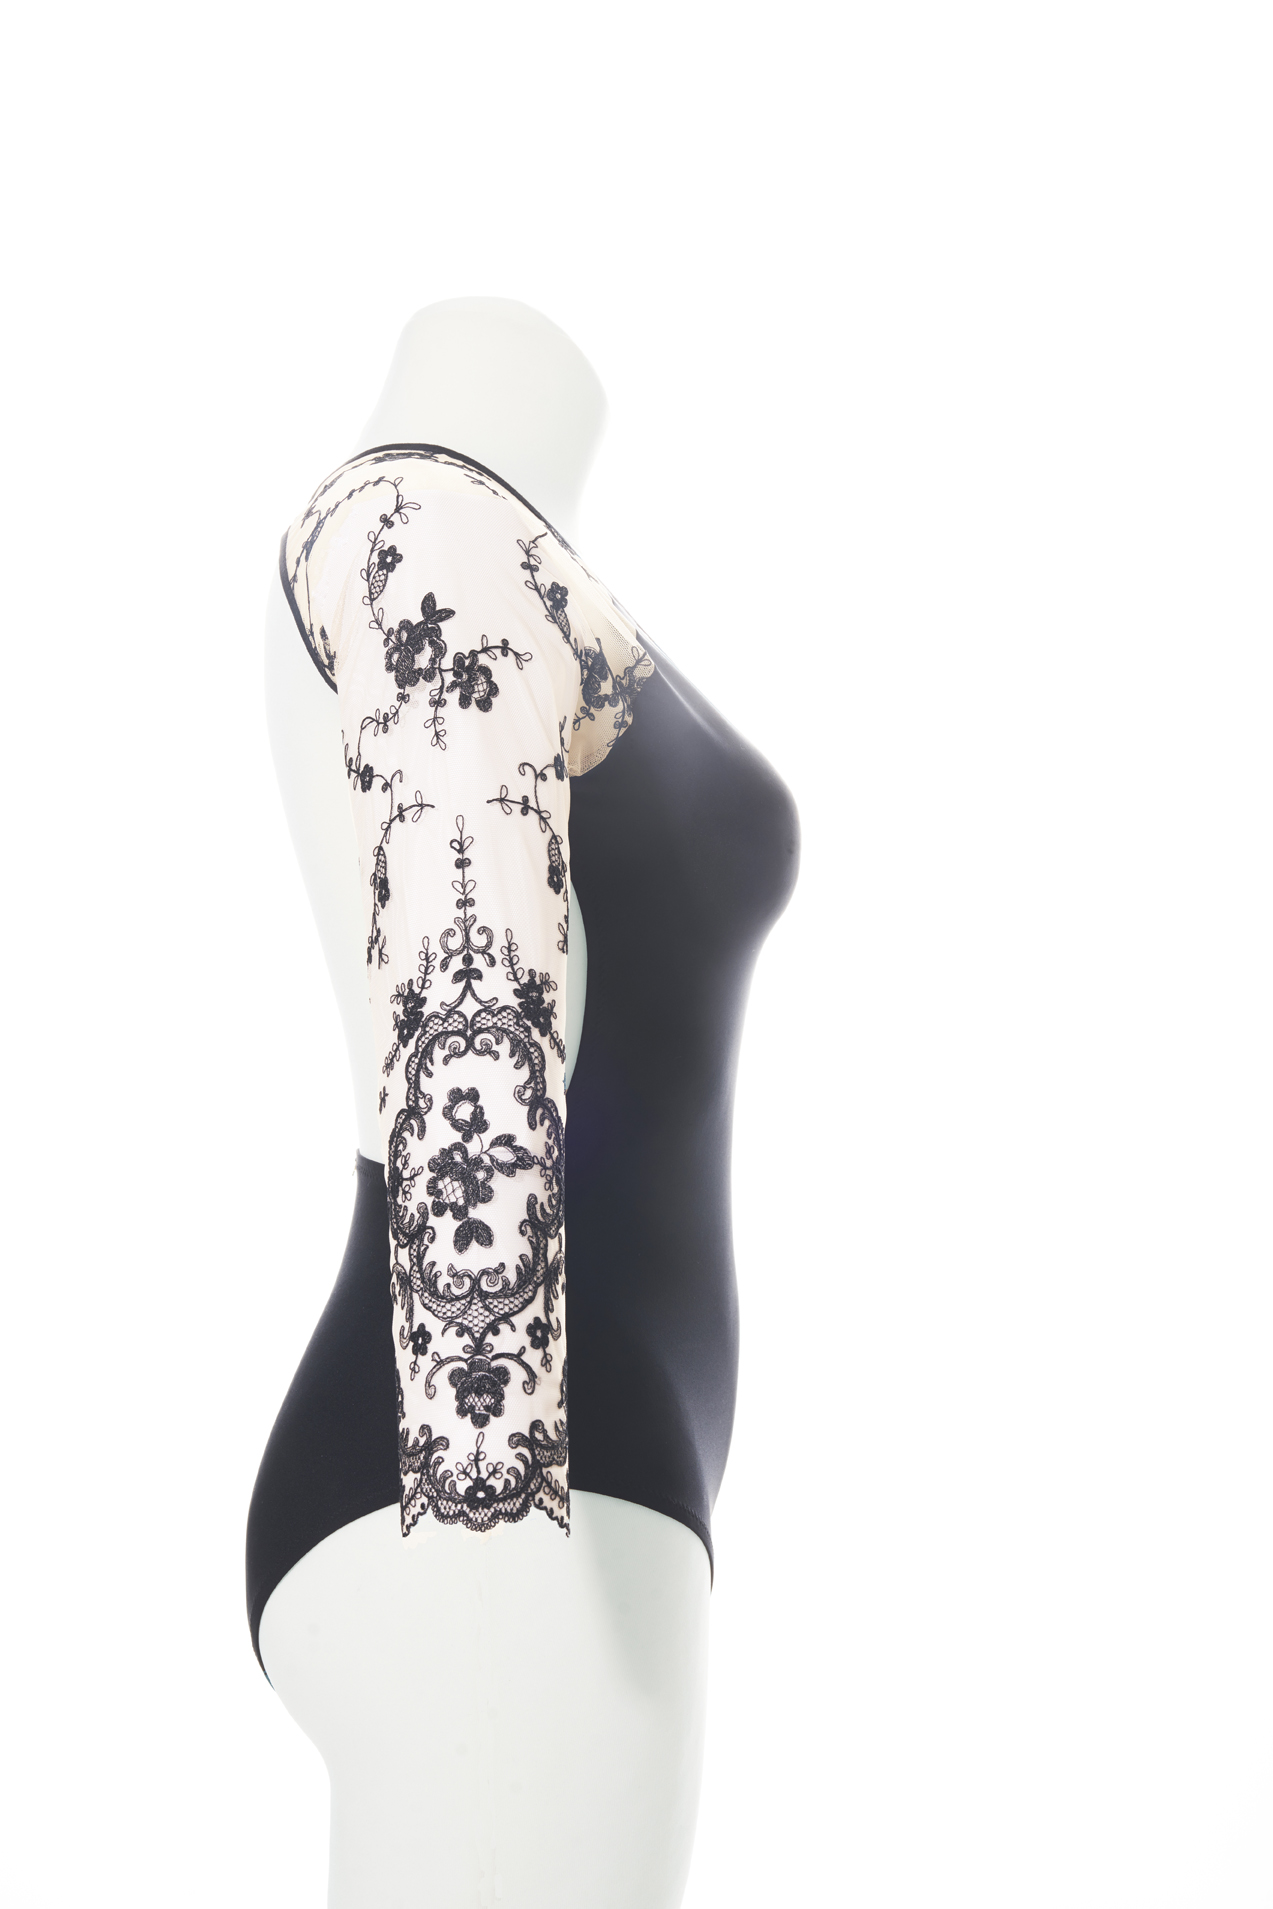 'KEIRA' onepiece Body